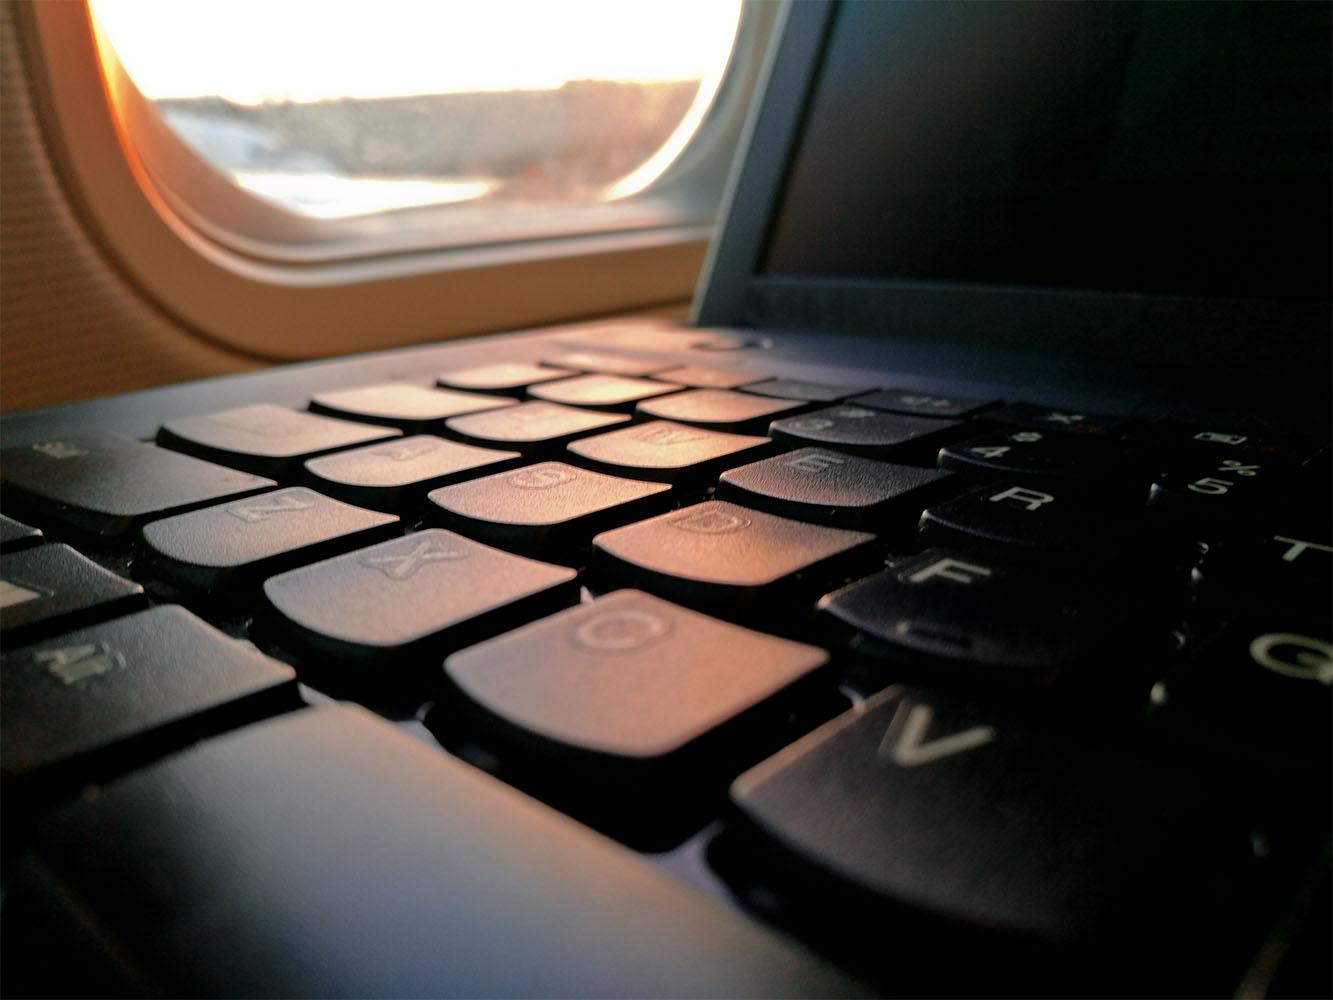 TMC_laptop-travel